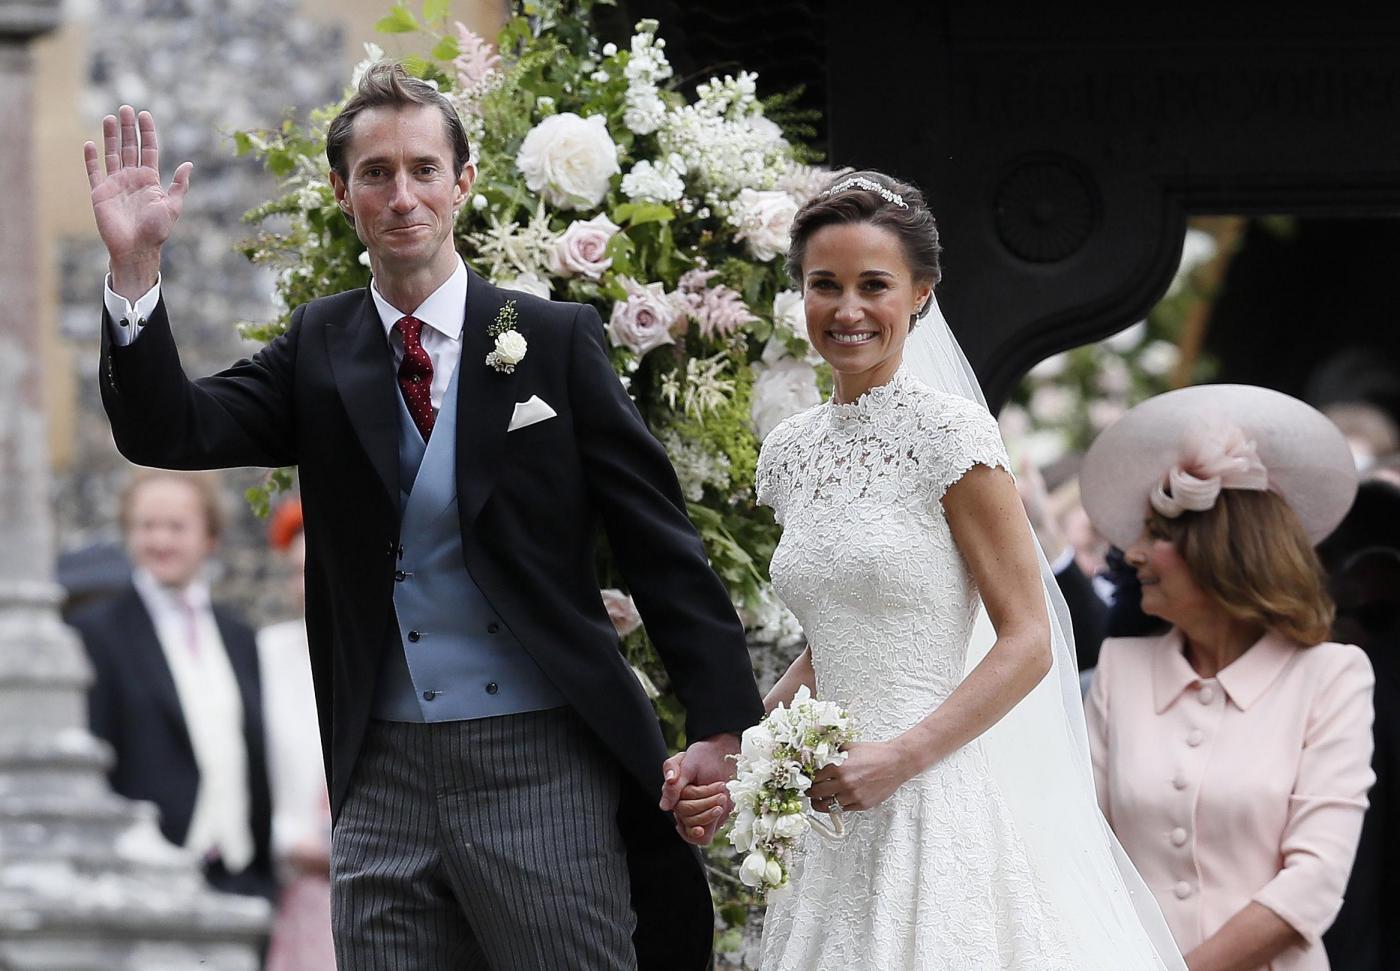 Le nozze di Pippa Middleton con James Matthews: quasi un Royal Wedding